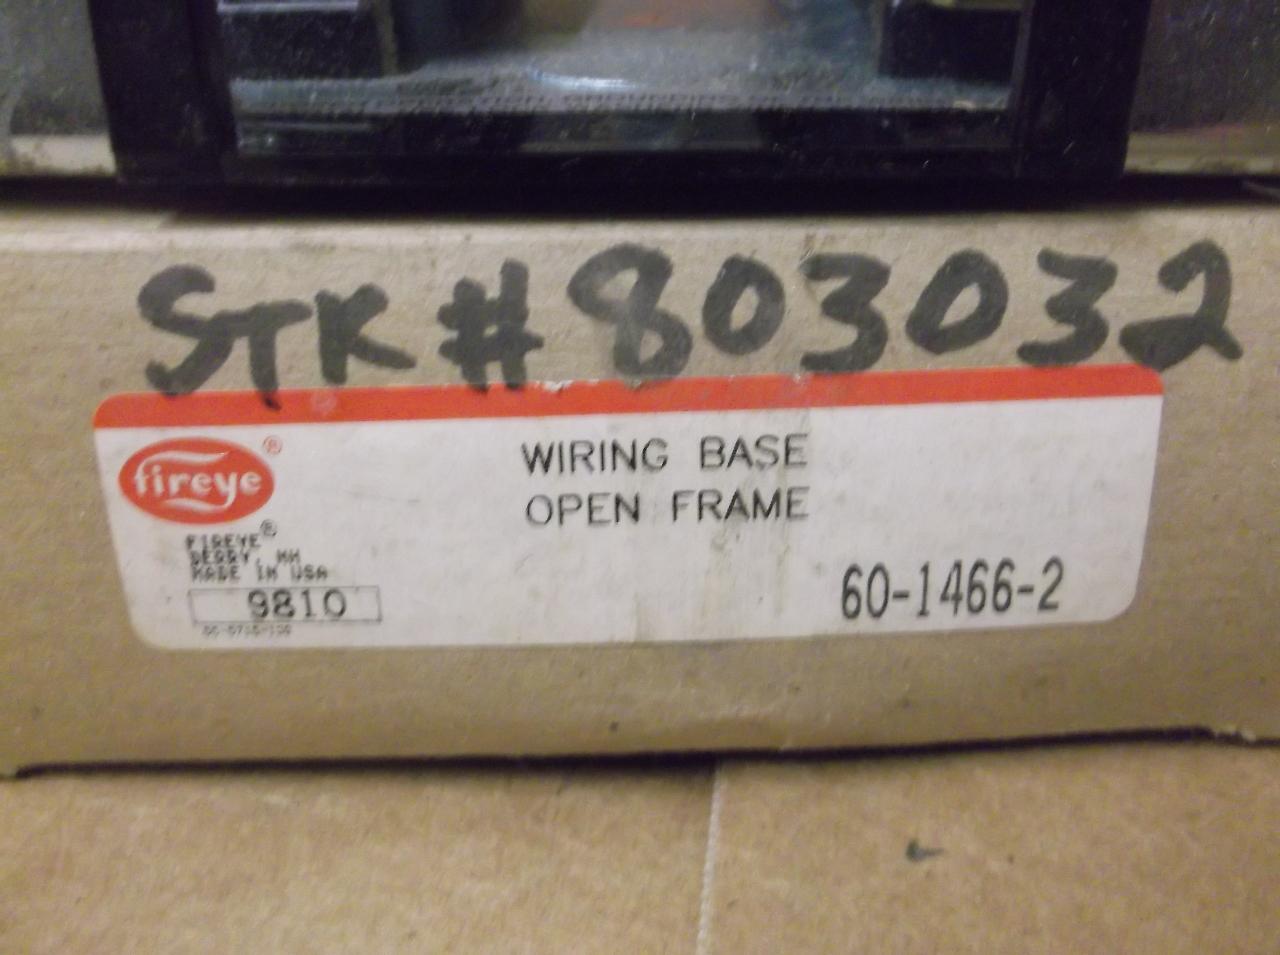 ... FIREYE WIRING BASE OPEN FRAME 60-1466-2 : what is open wiring - yogabreezes.com